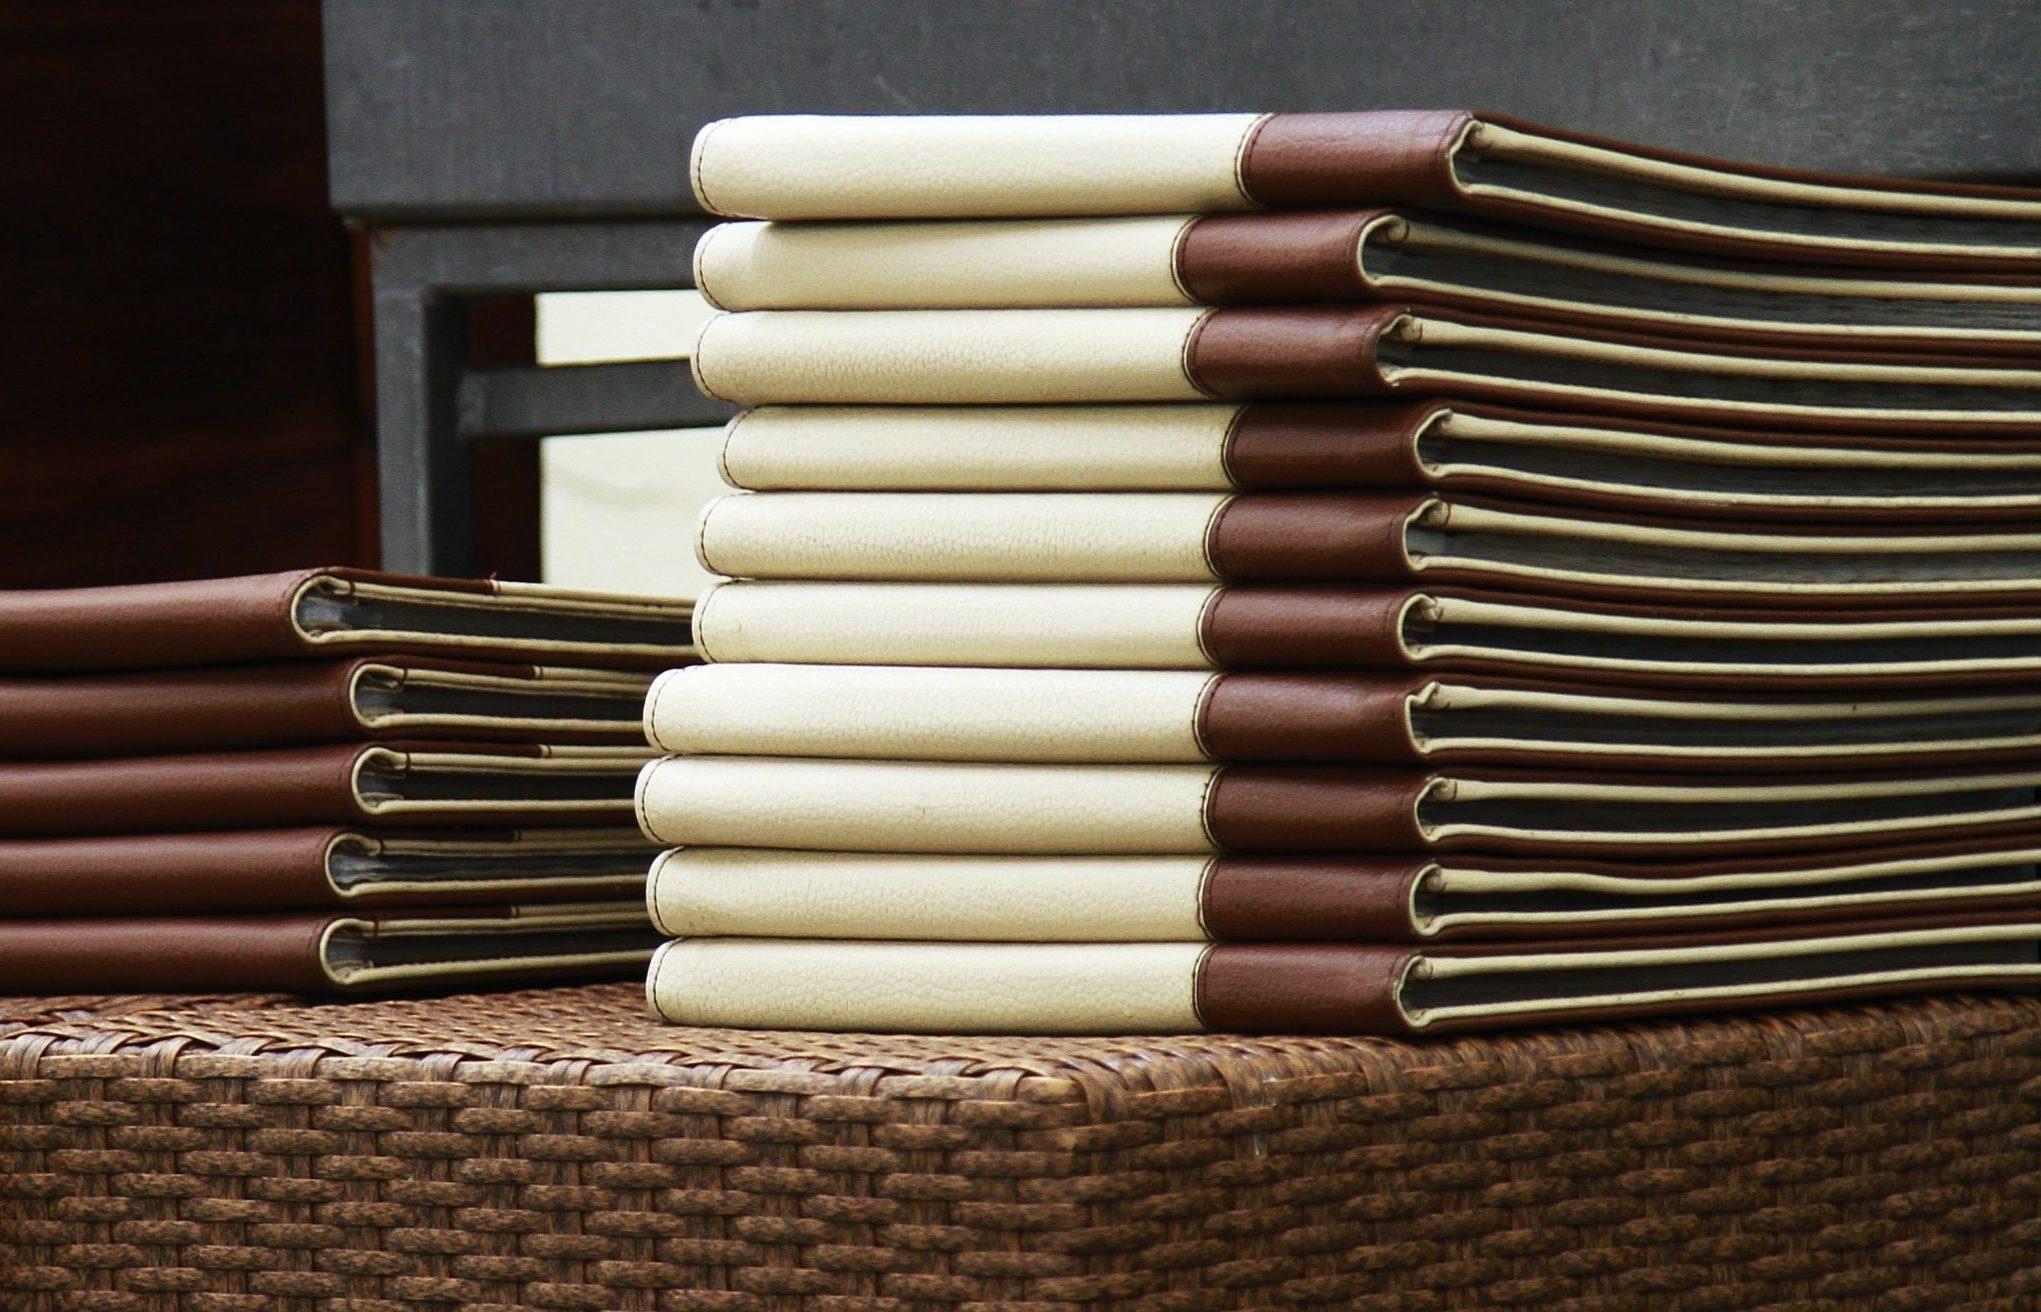 stack of menus in a restaurant